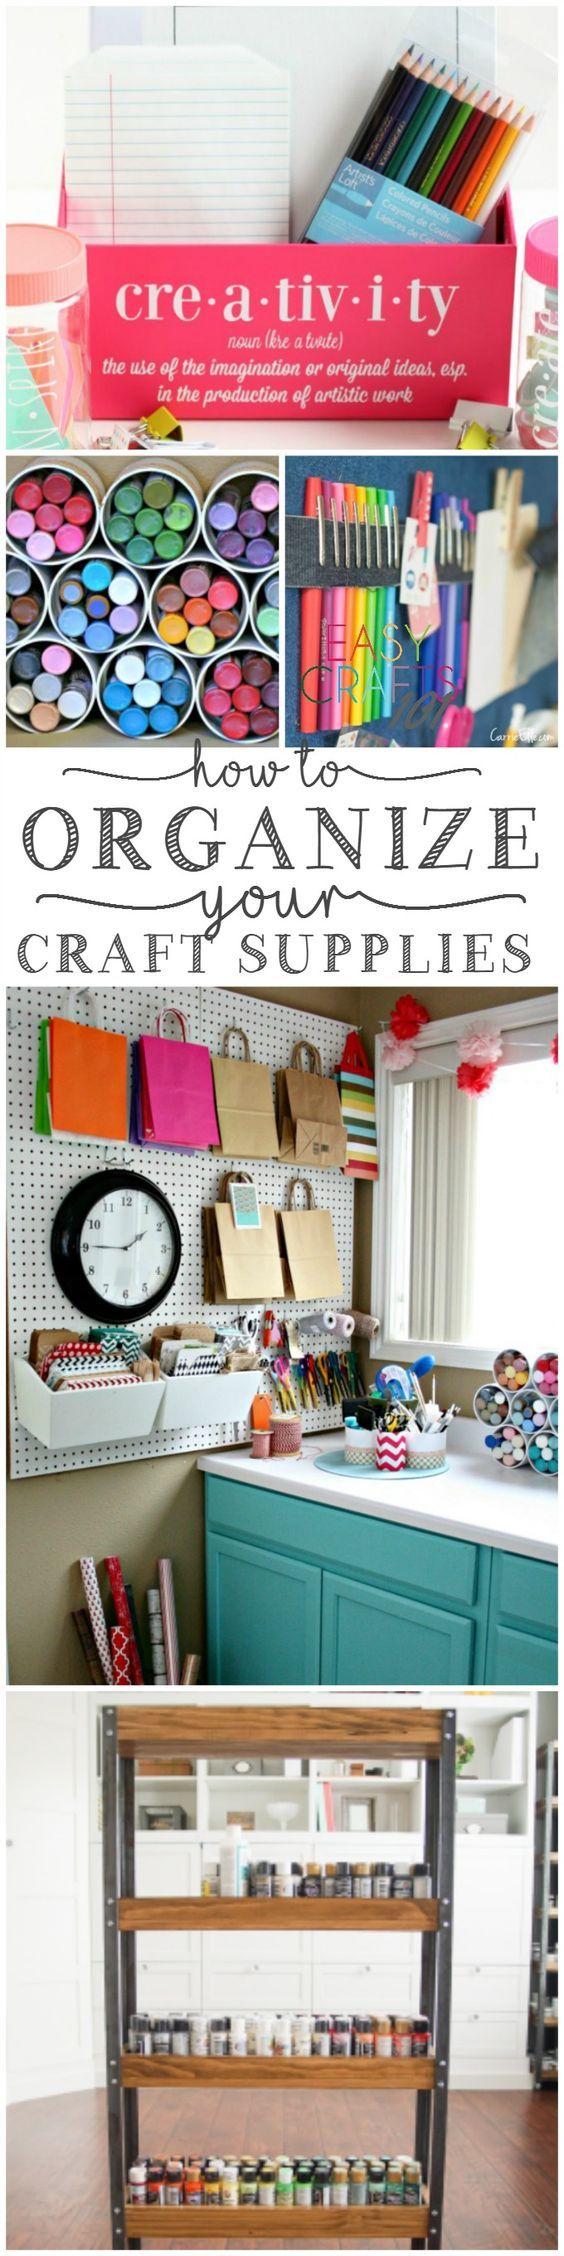 'Craft Room Organization Ideas...!' (via Easy Crafts 101)